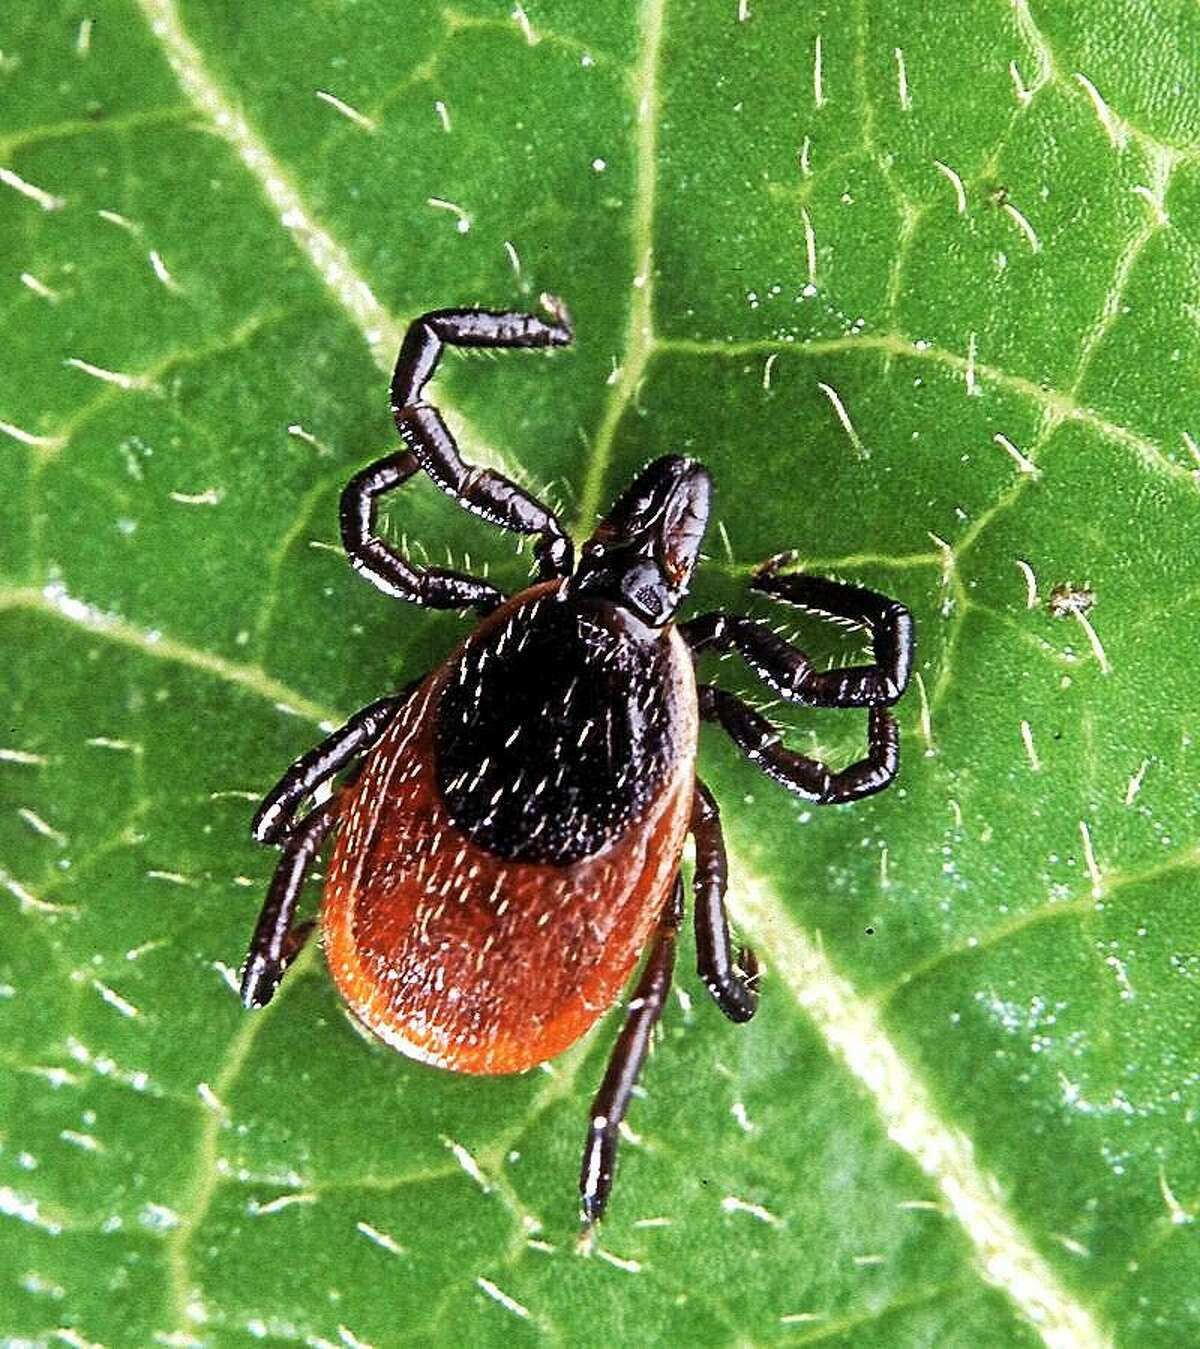 A blacked-legged, or deer, tick.